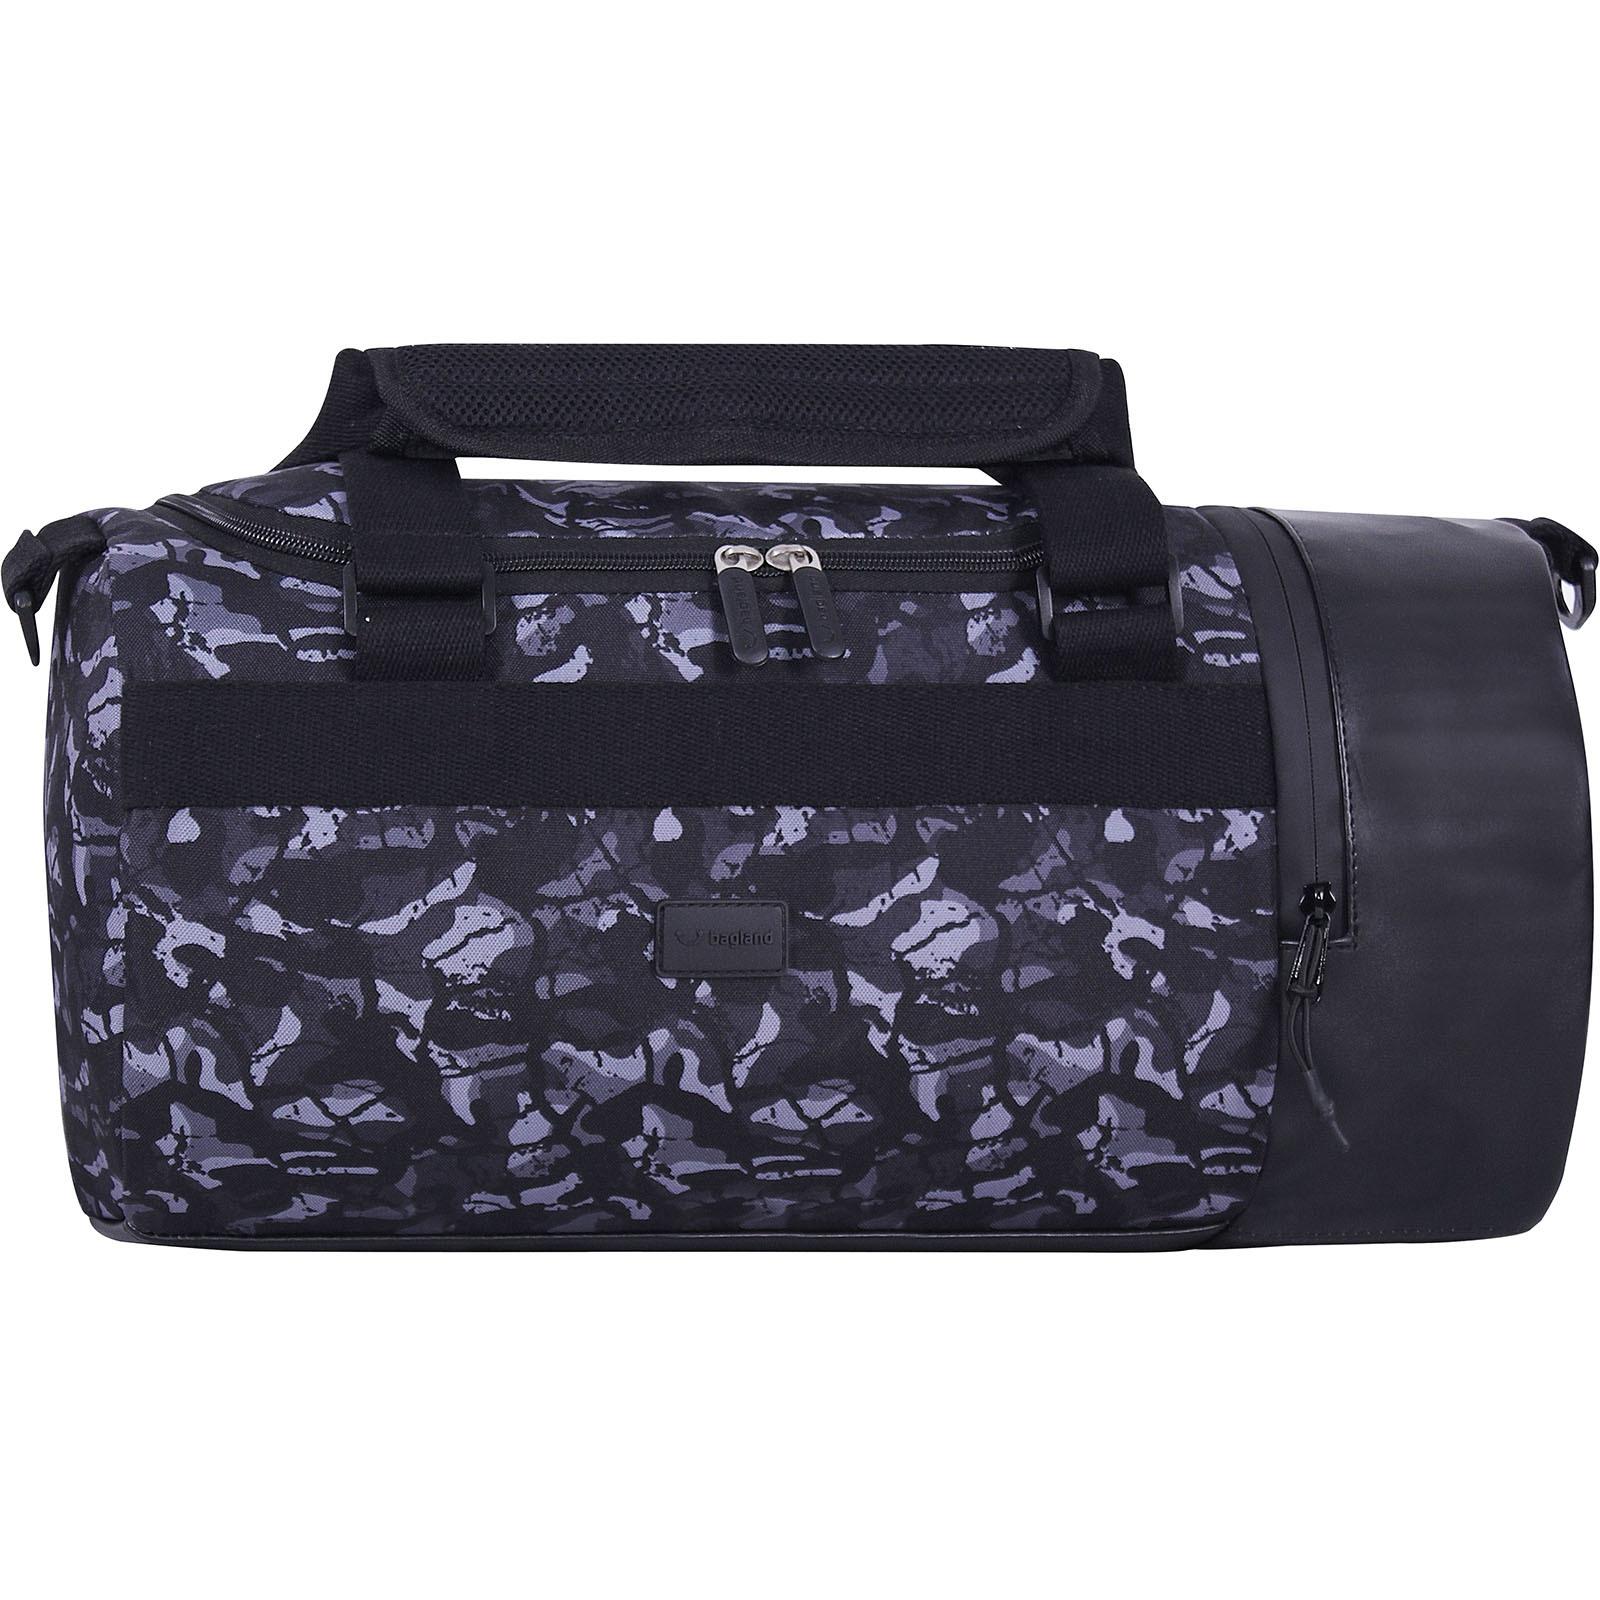 Спортивные сумки Сумка Bagland Klerk 22 л. сублимация 465 (00327664) IMG_6190_суб.465_.JPG